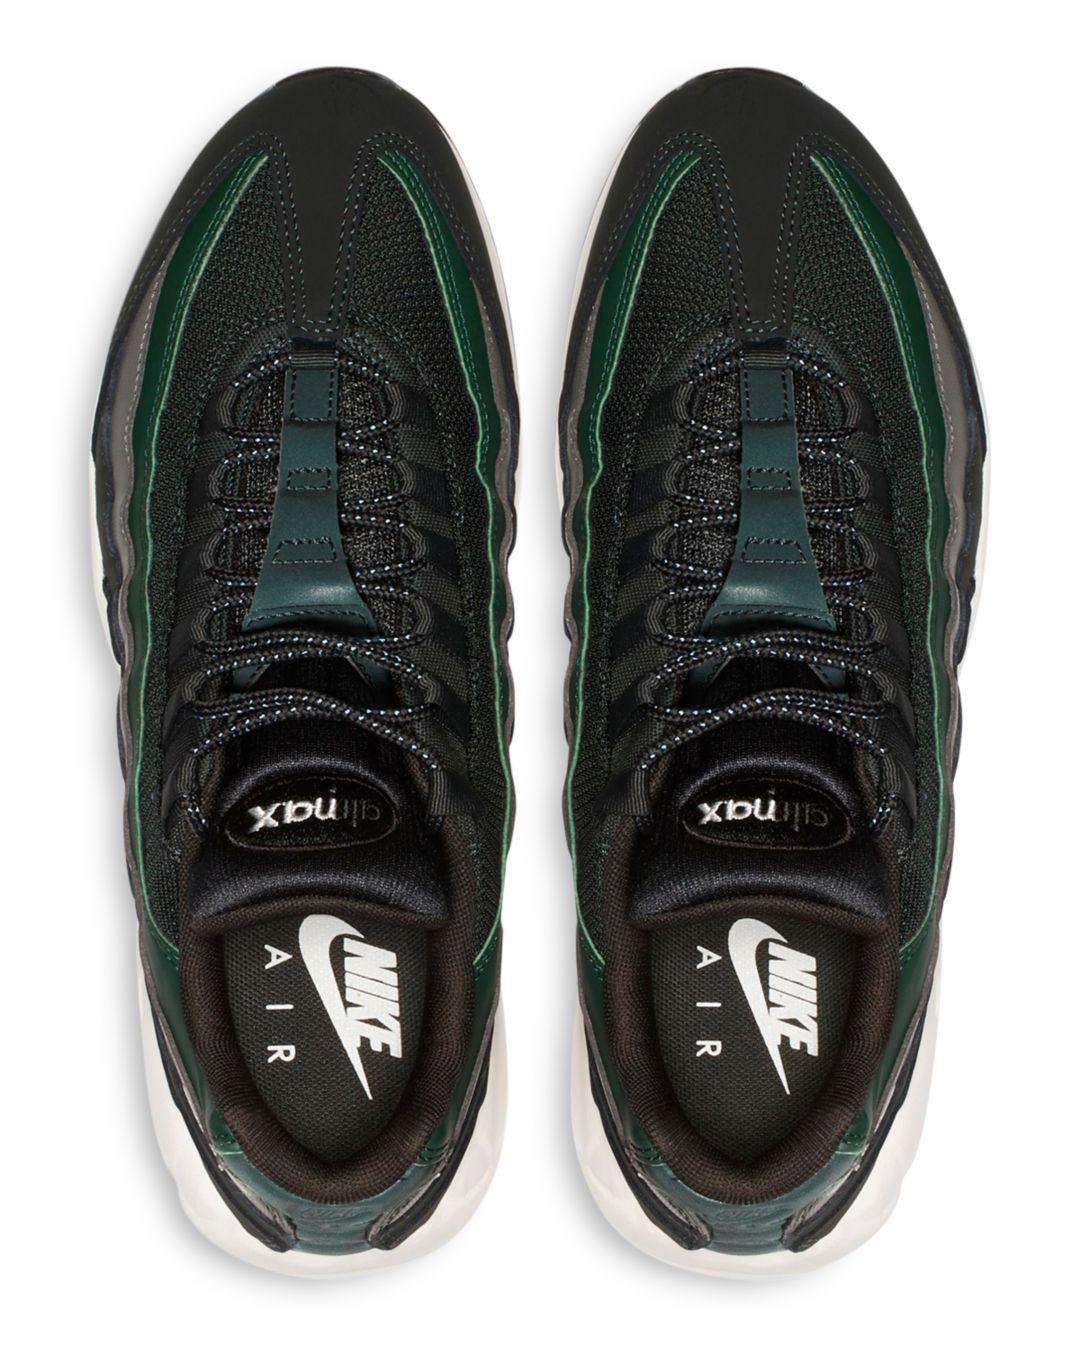 8820938cef49 Lyst - Nike Air Max 95 Essential Outdoor Green  Sail-fir-vintage Lichen in  Green for Men - Save 14%